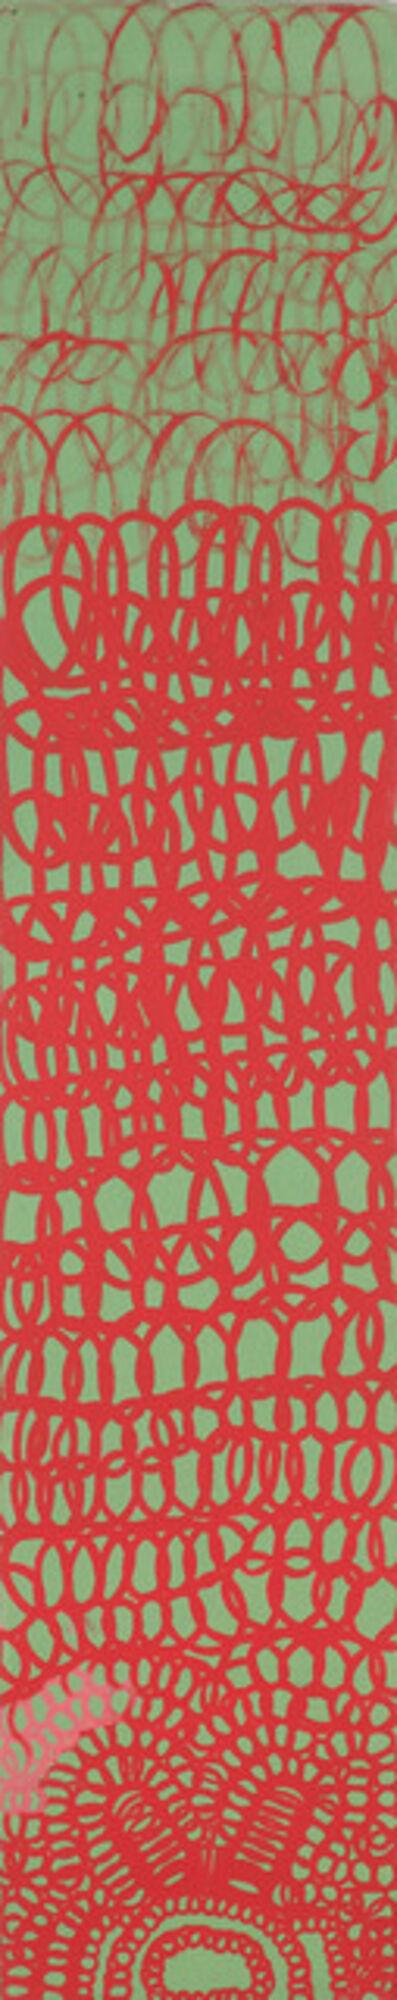 "Alfred Klinkan, '""Frühling"" (Spring)', 1972"